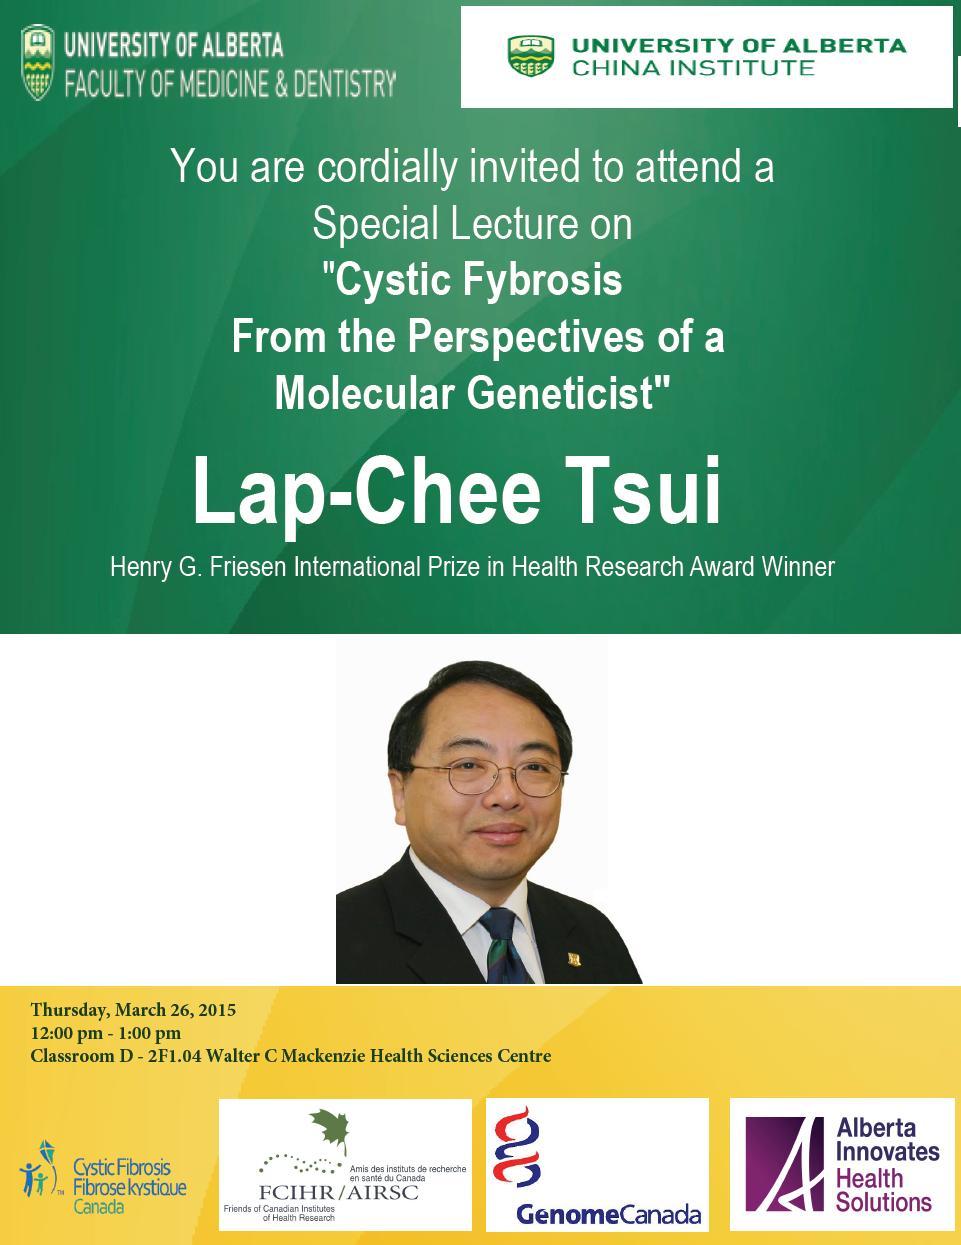 U Alberta Edmonton Poster - Dr. Lap-Chee Tsui